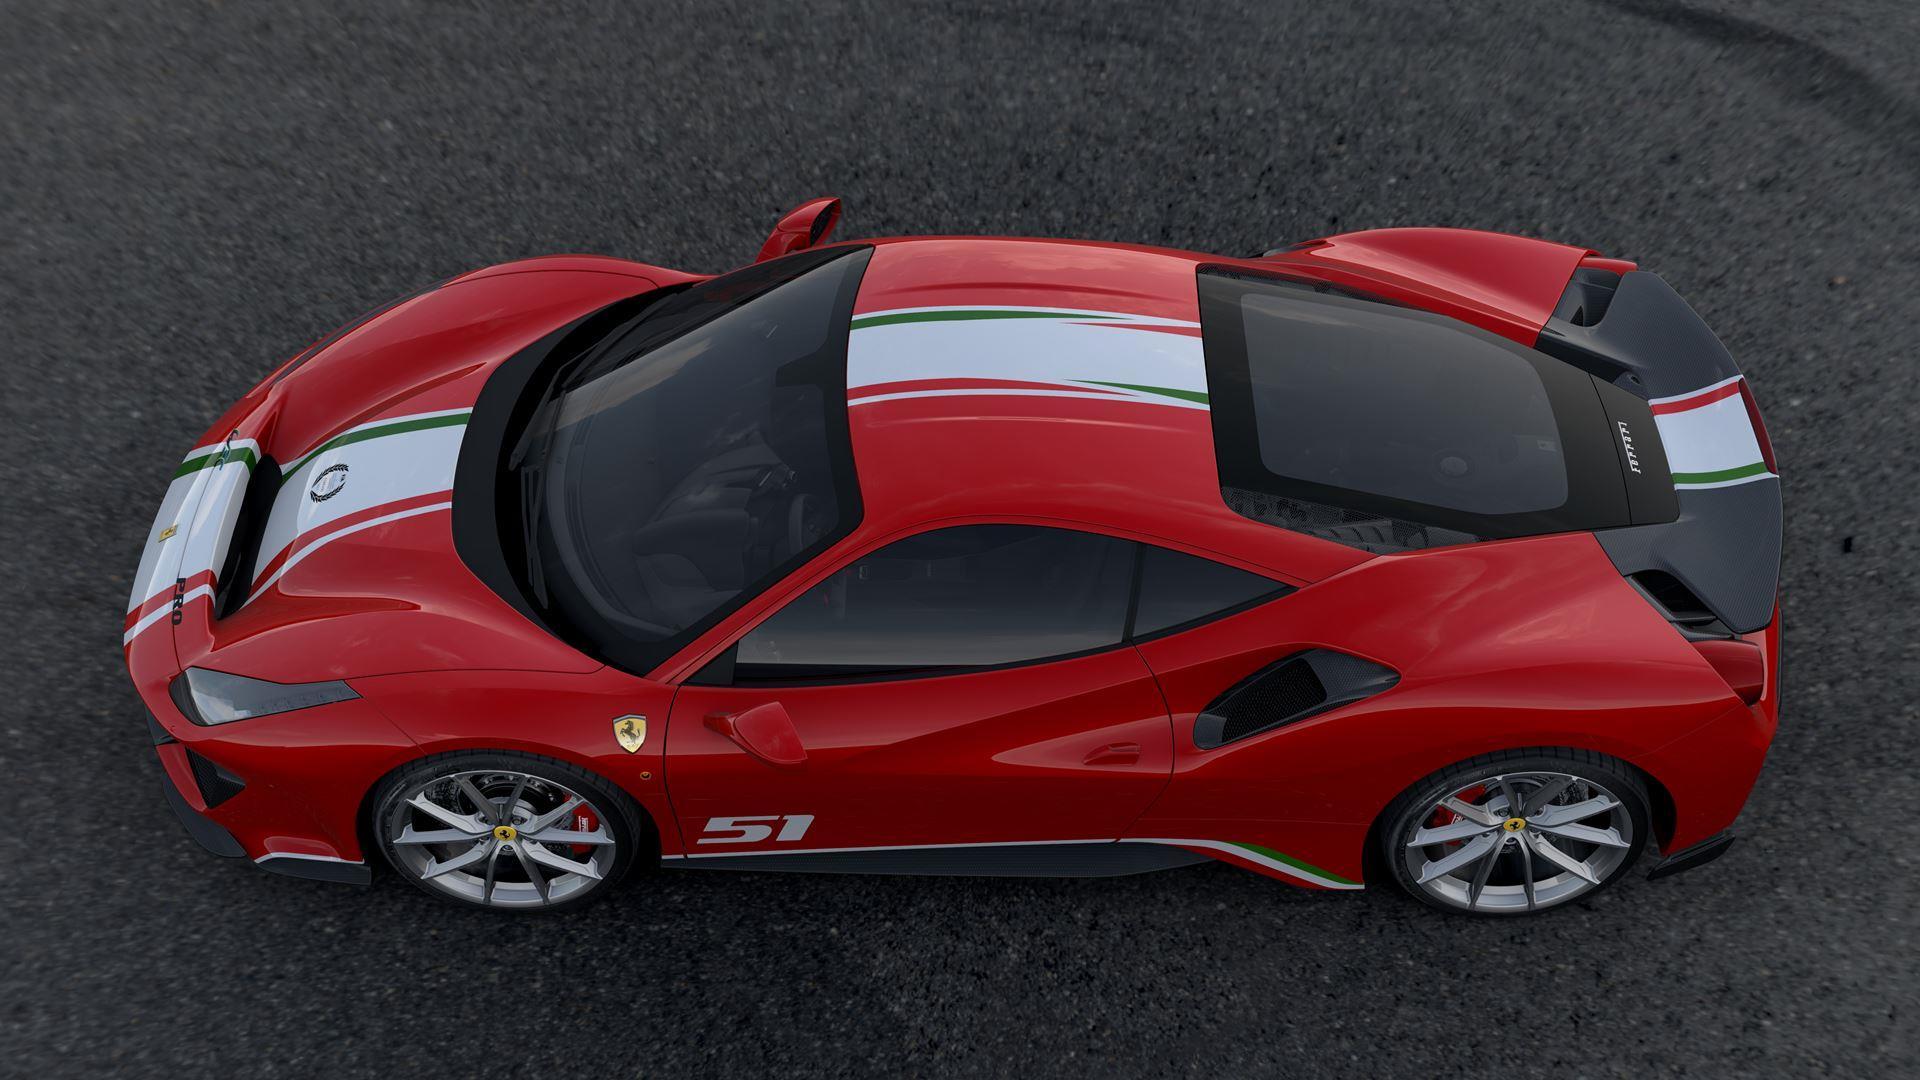 2018 Ferrari 488 Pista Piloti Specification News And Information